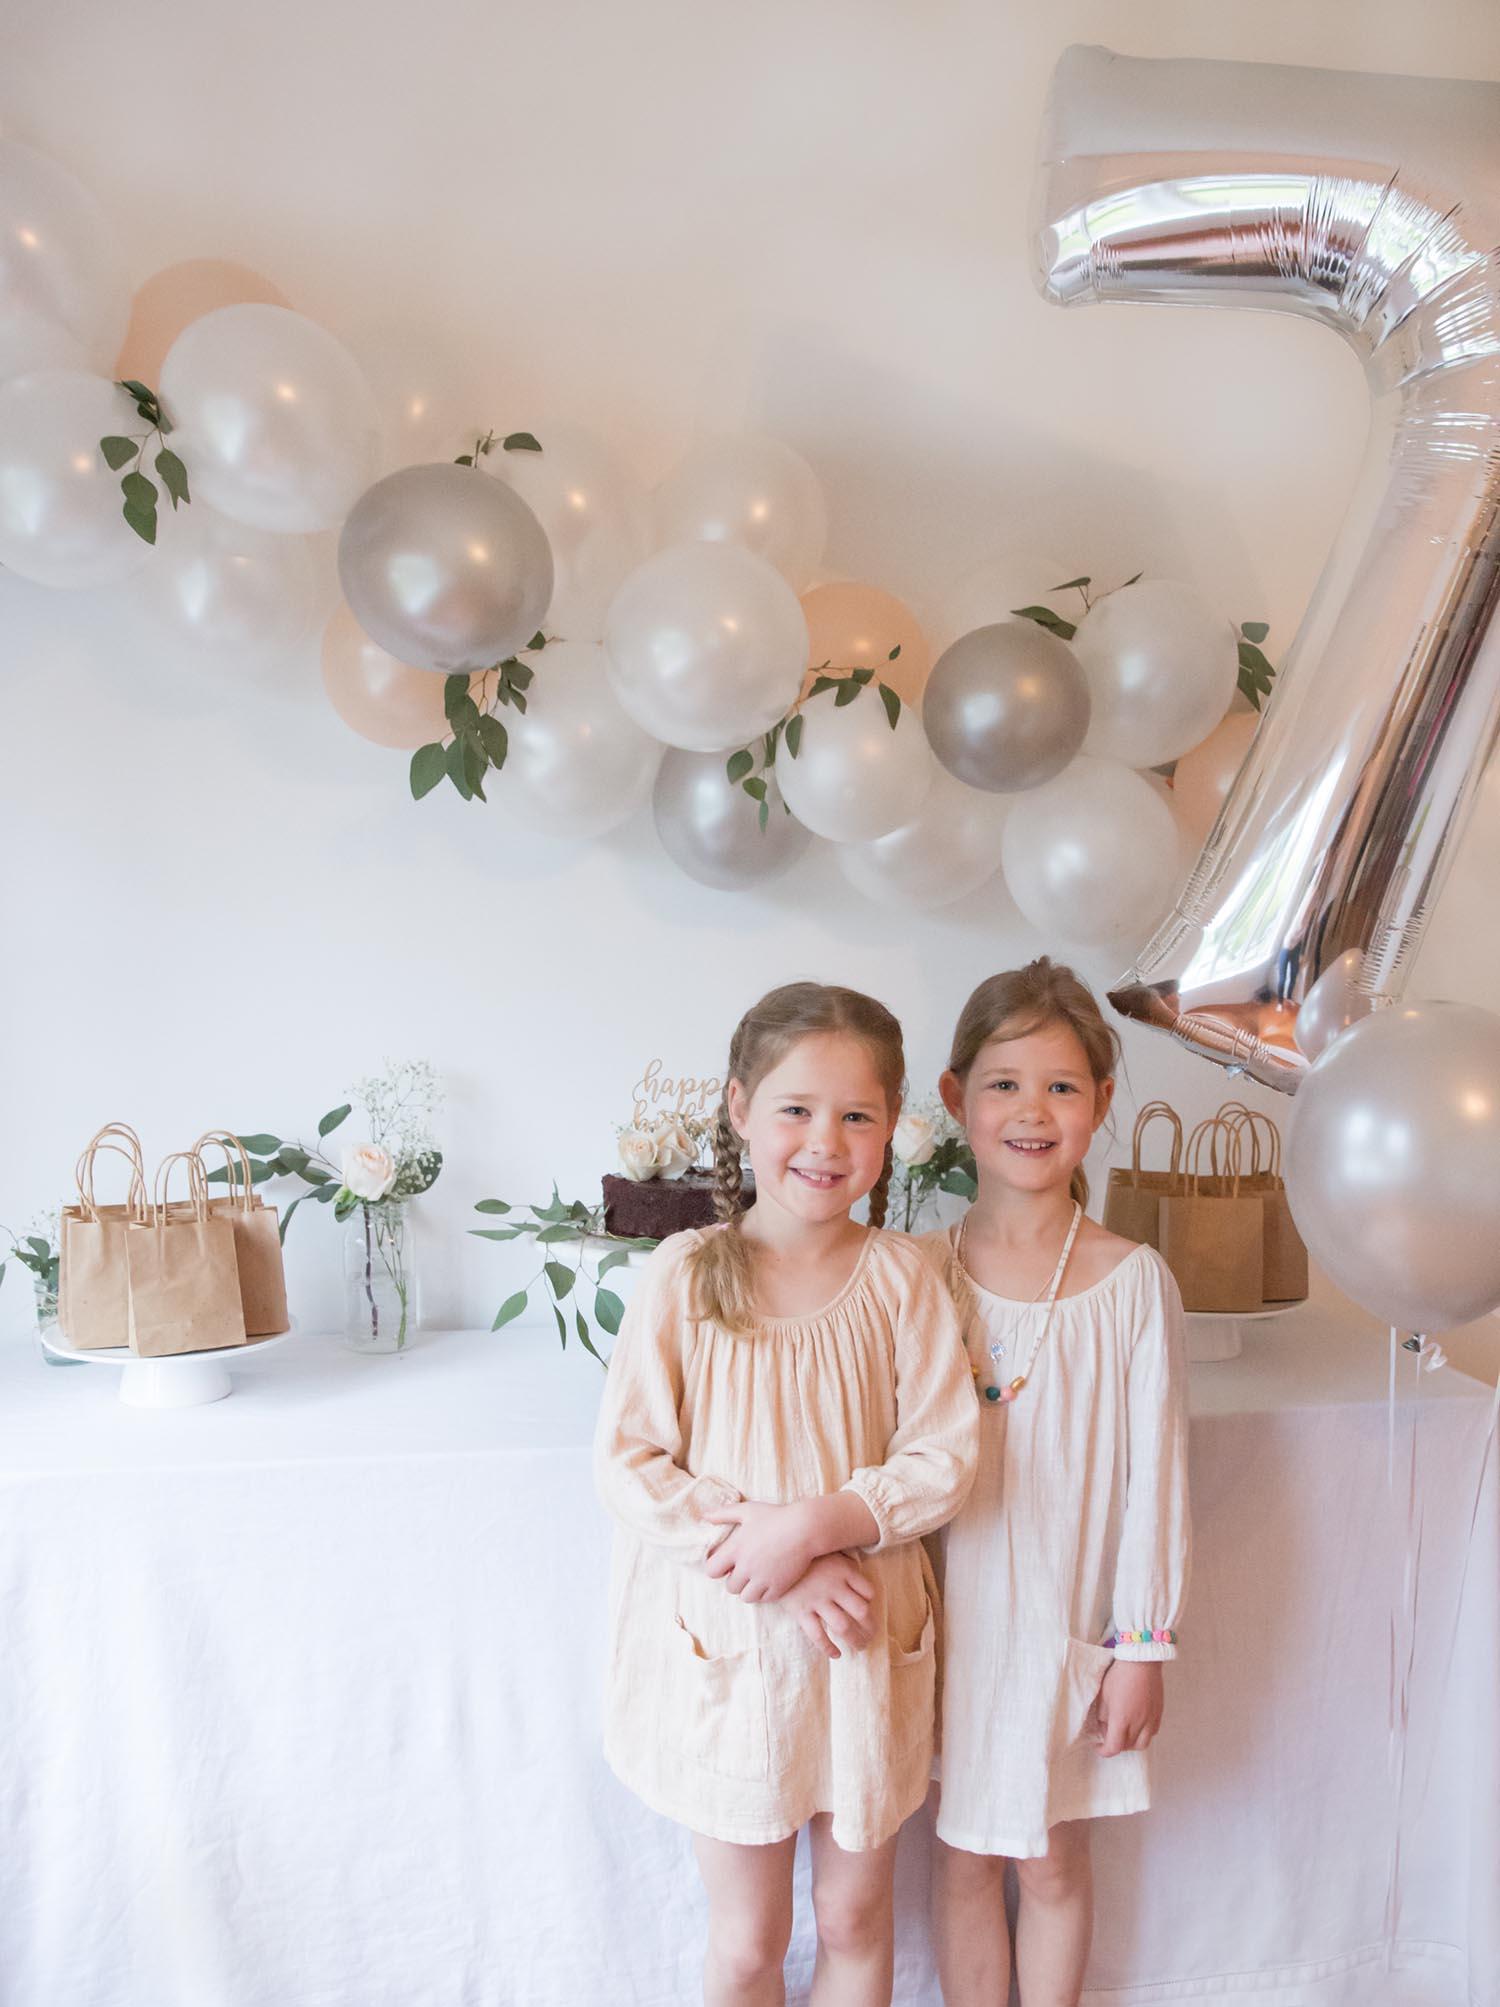 twins 7th birthday